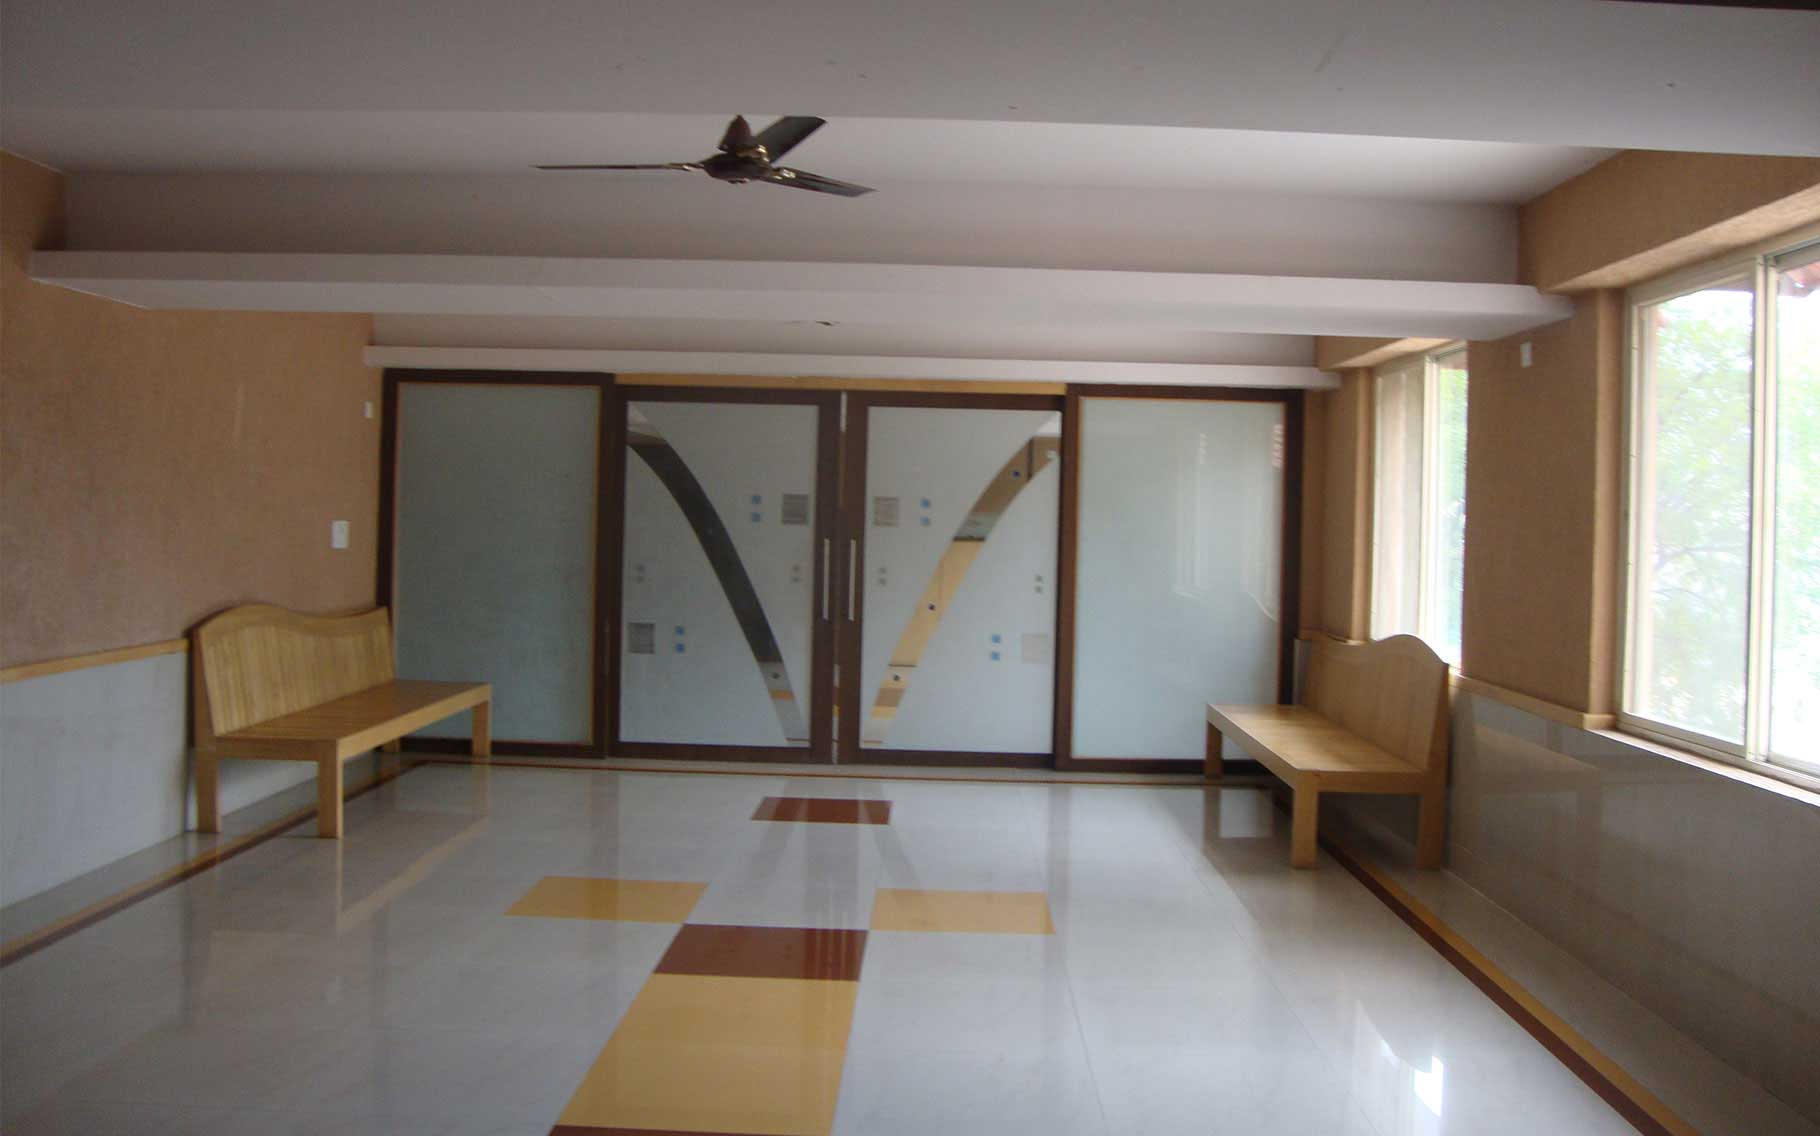 Flats in JP Nagar